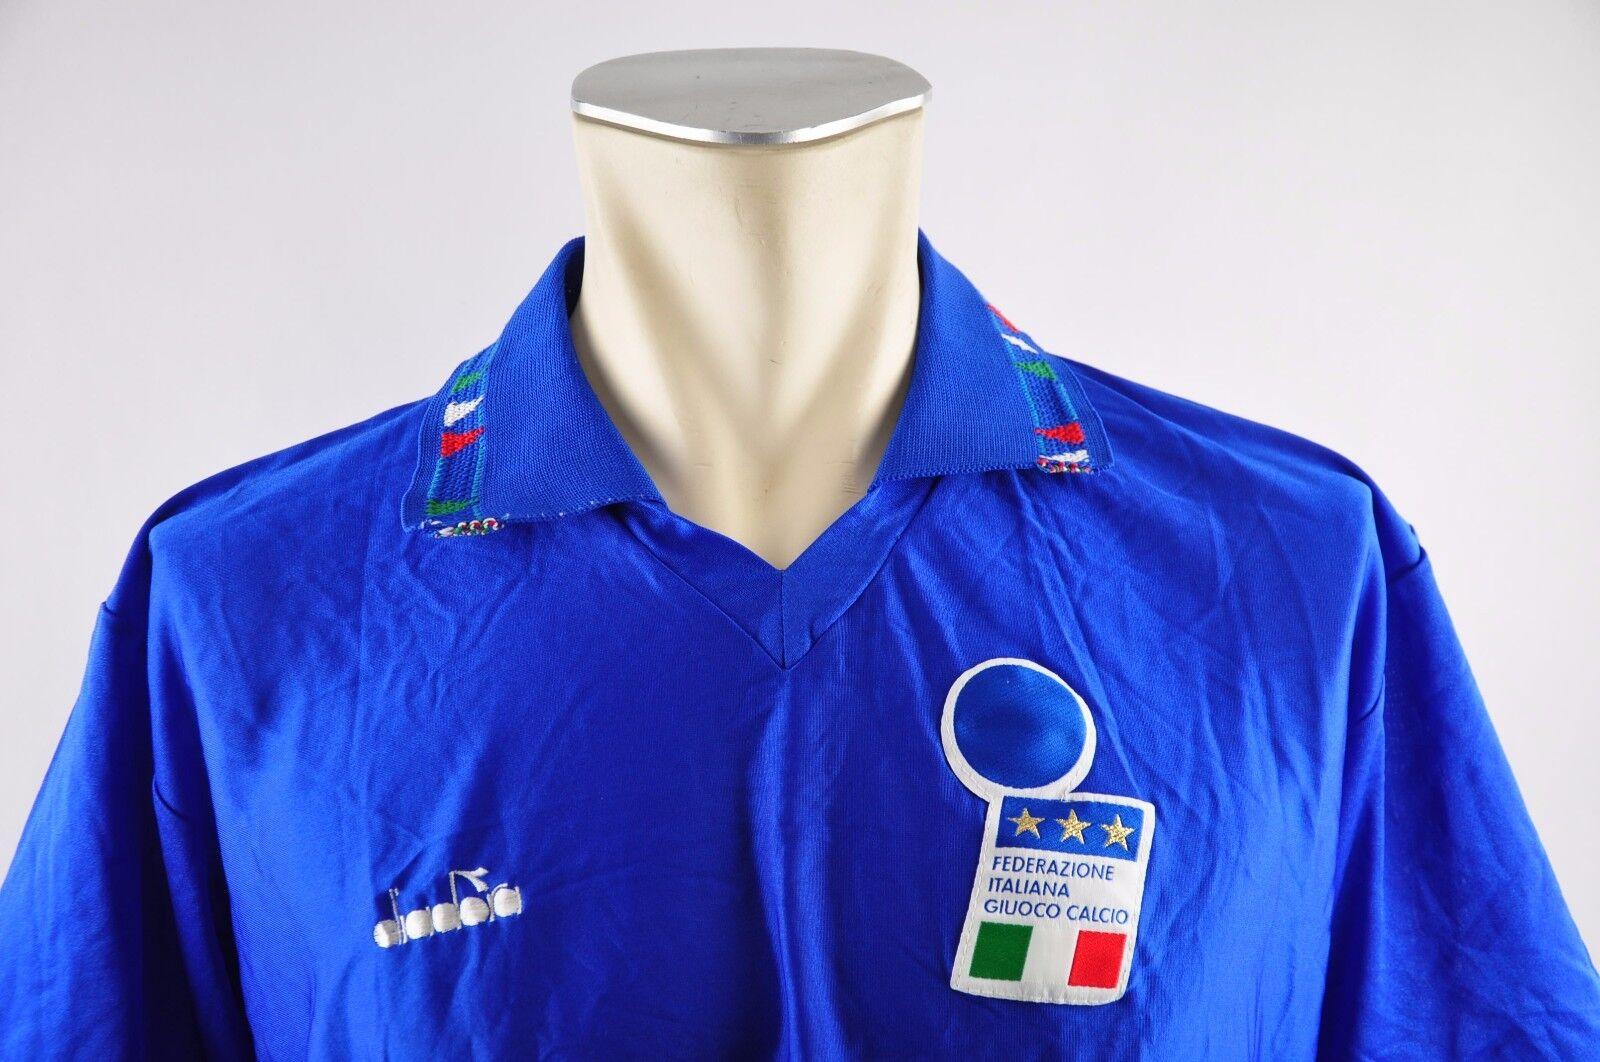 Italien Trikot 1992 Gr. XL vintage Jersey EM EM EM Home blau  maglia Diadora WM  | Komfort  e6c83c